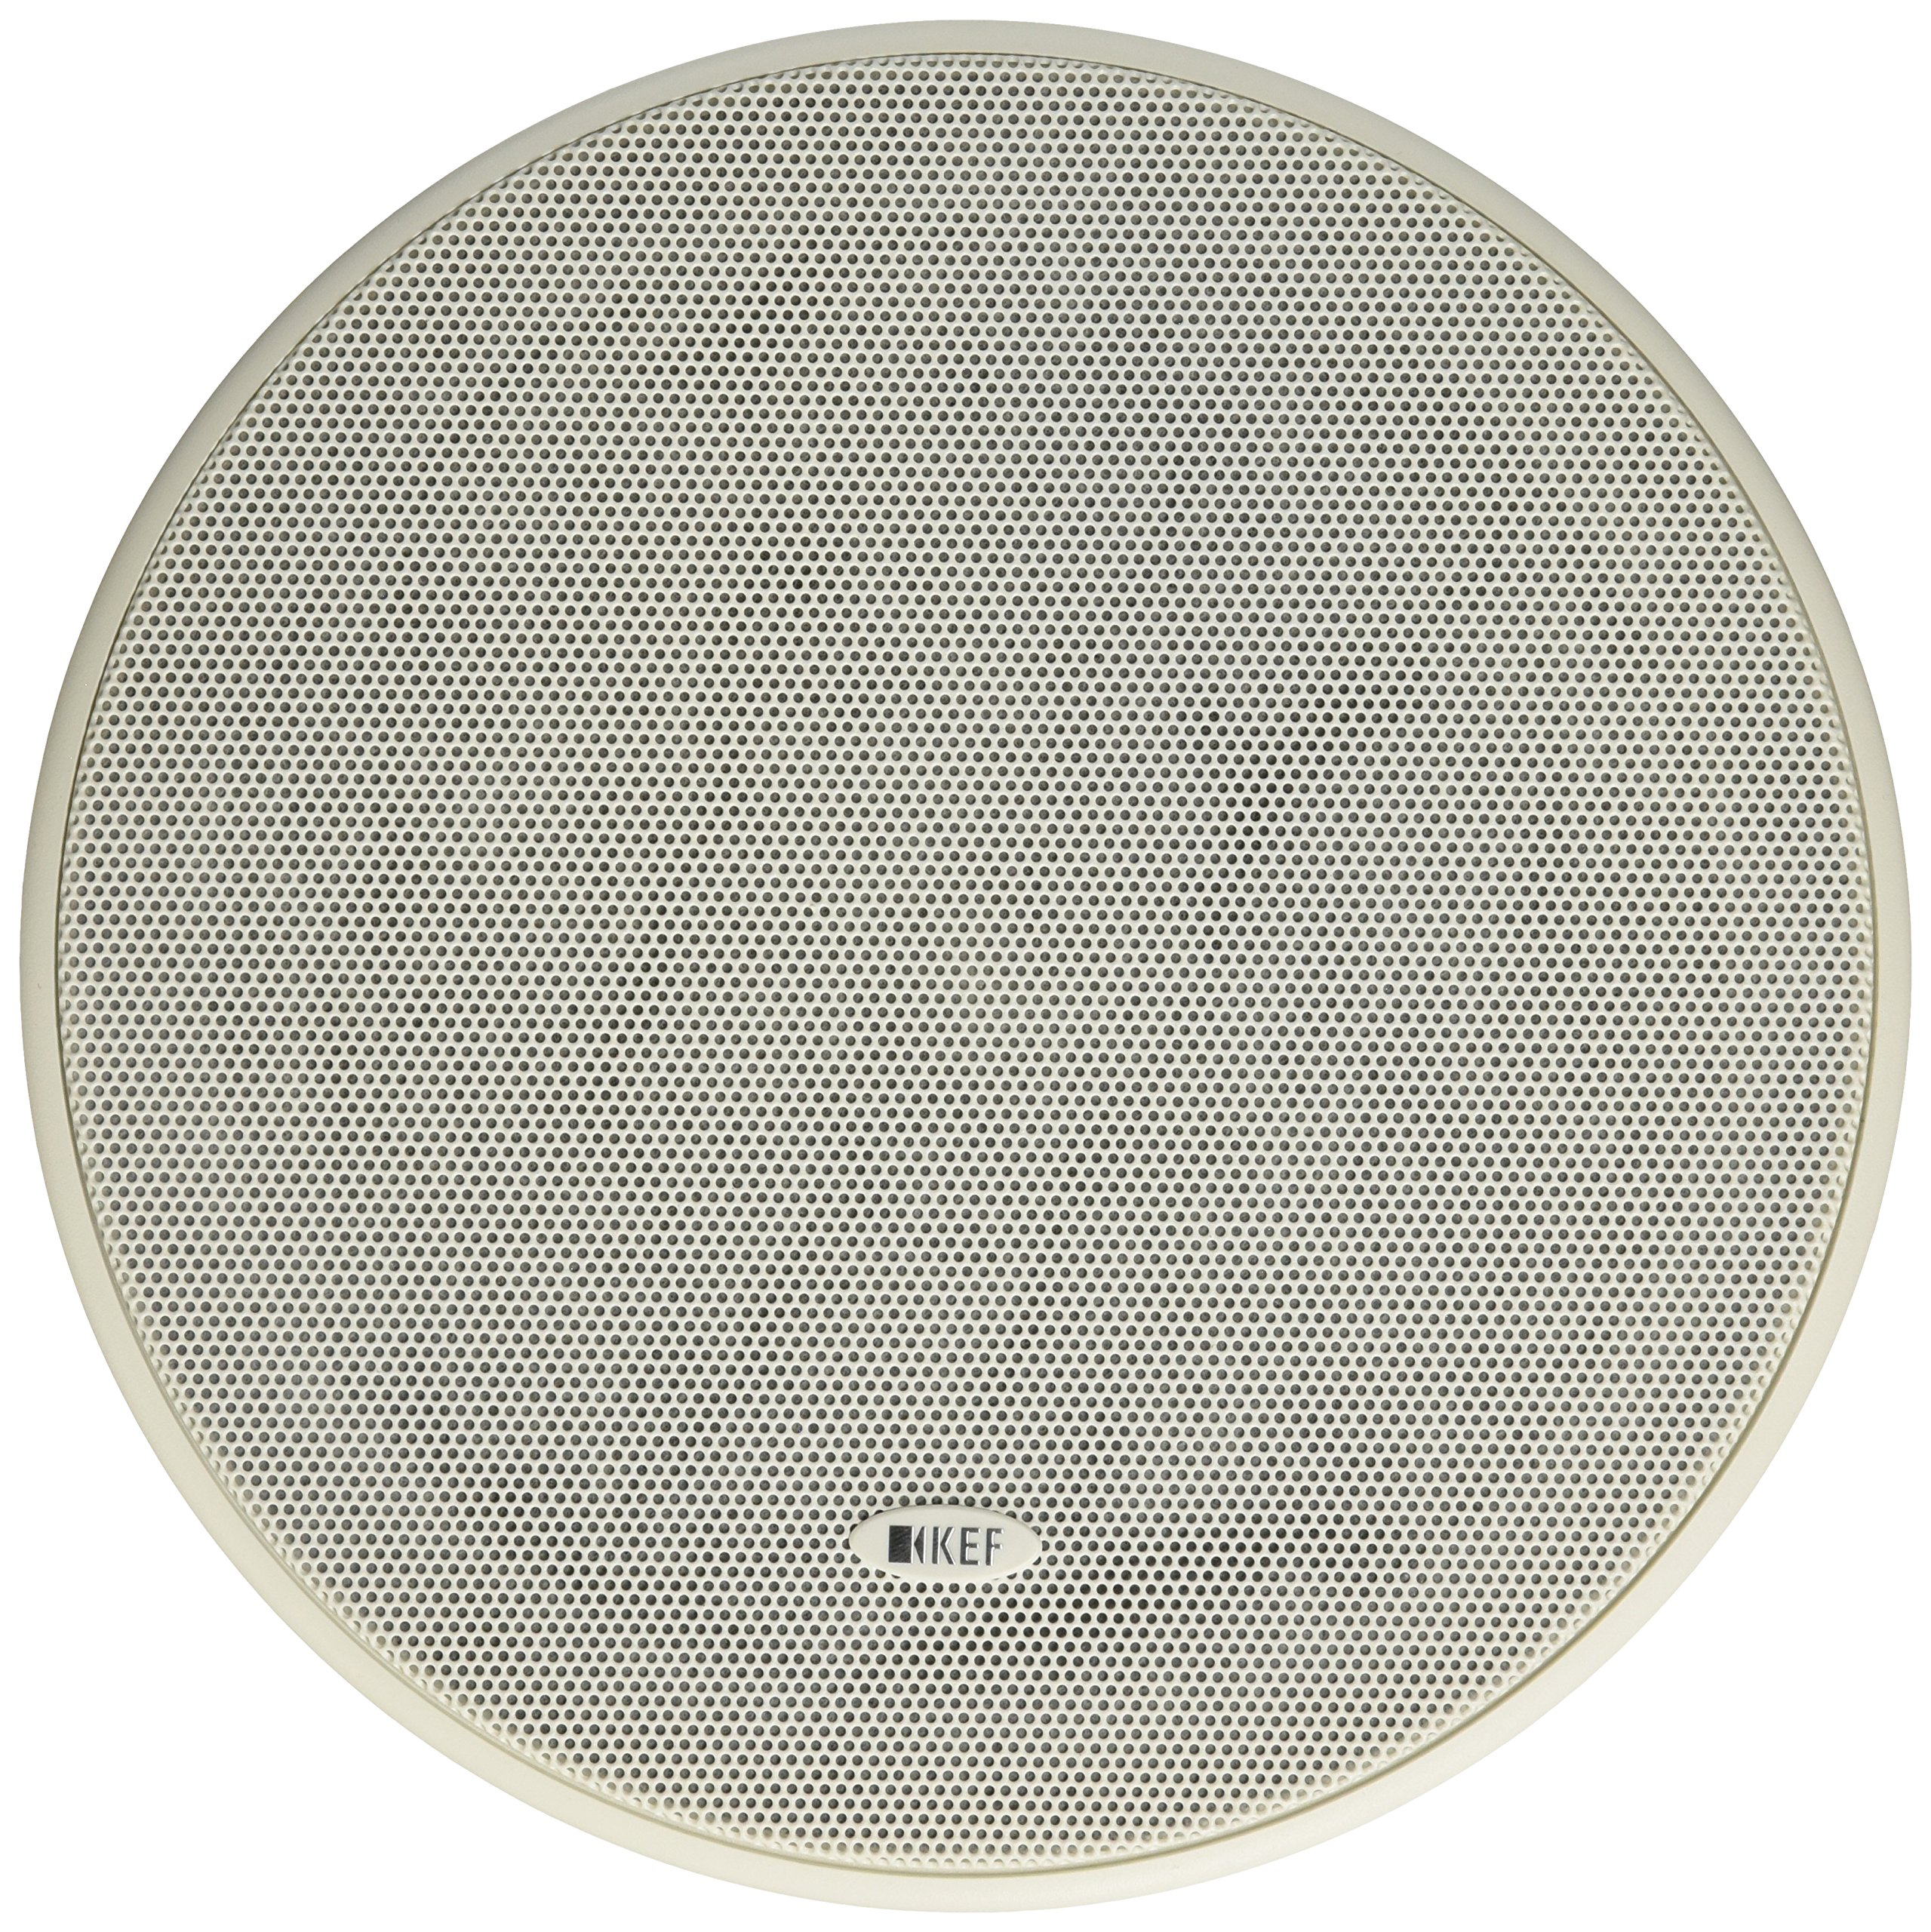 KEF CI160QR Round In-Ceiling Speaker Architectural Loudspeaker (Single),White